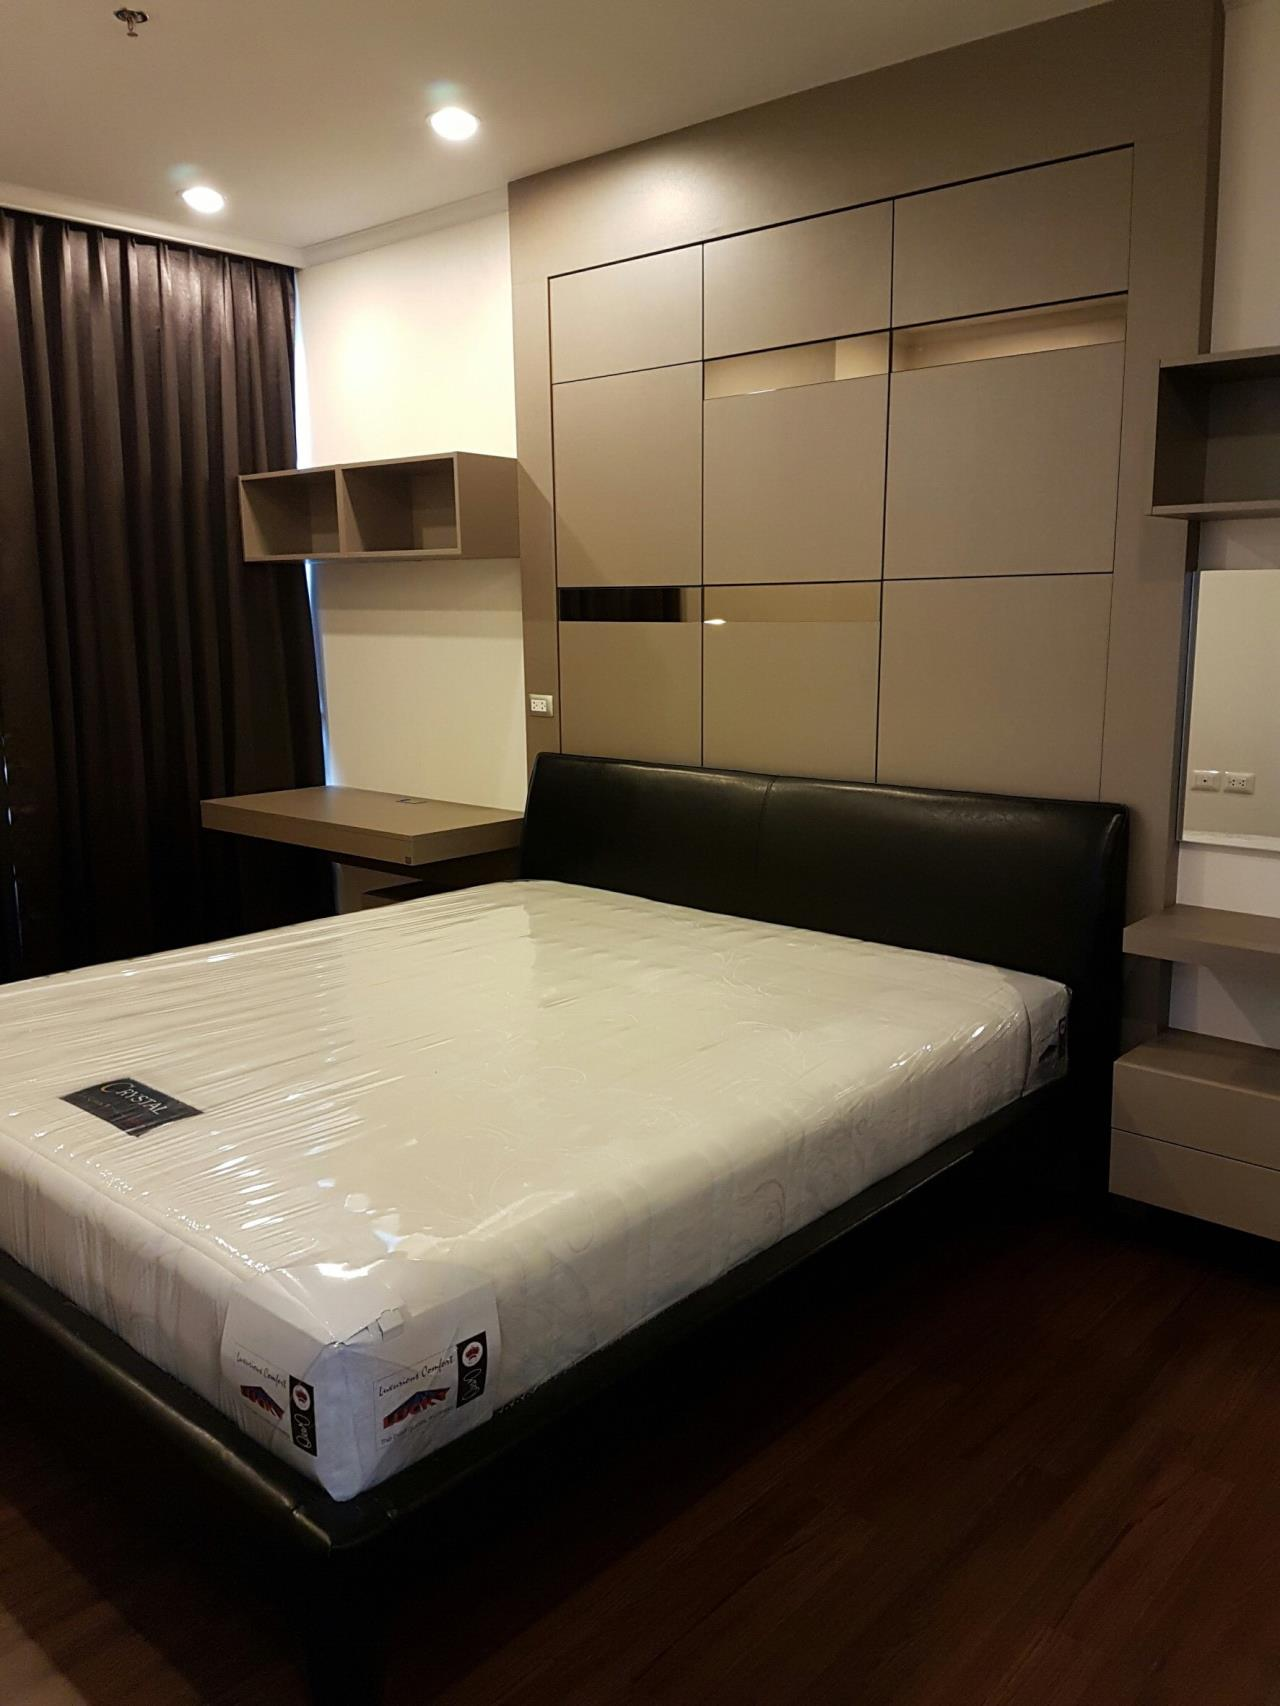 Quality Life Property Agency's supalai elite sathorn-suanplu [ FOR RENT / SALE] 6